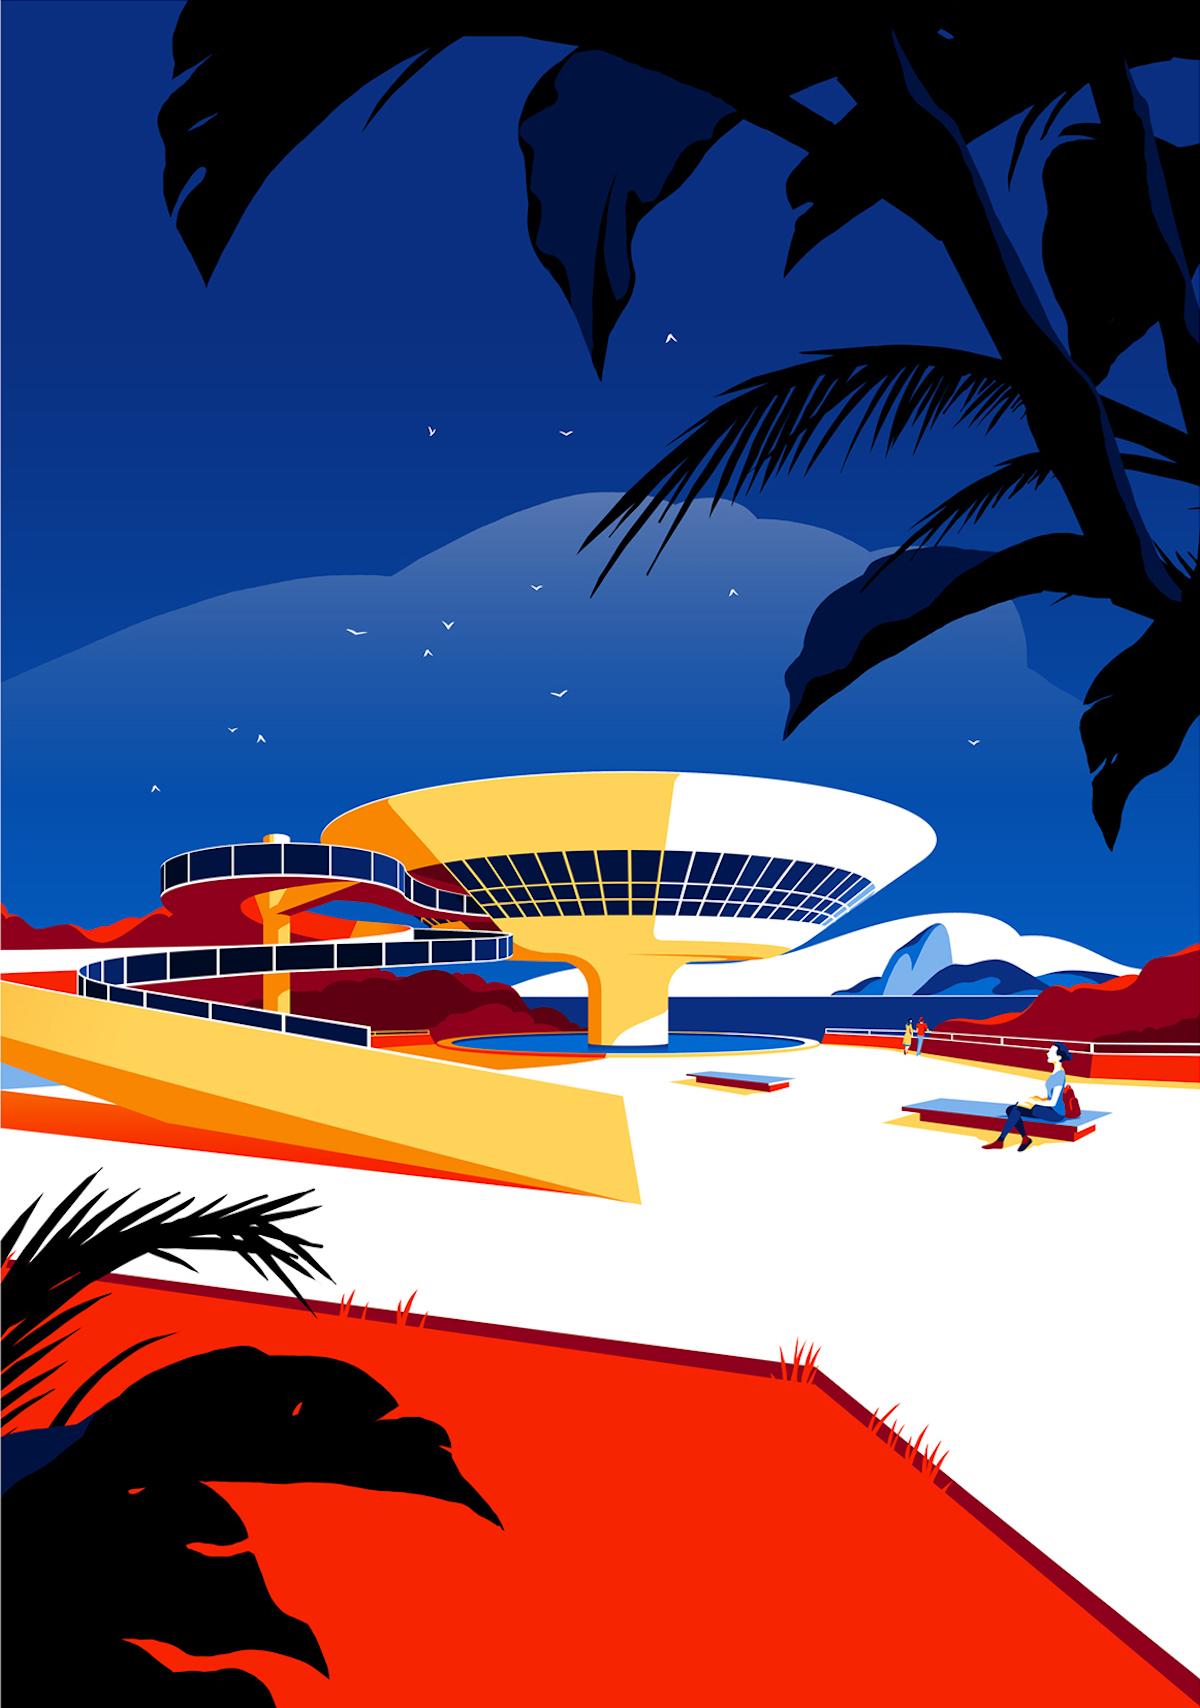 oscar-niemeyer-architecture-illustrations-levente-szabo-11-1